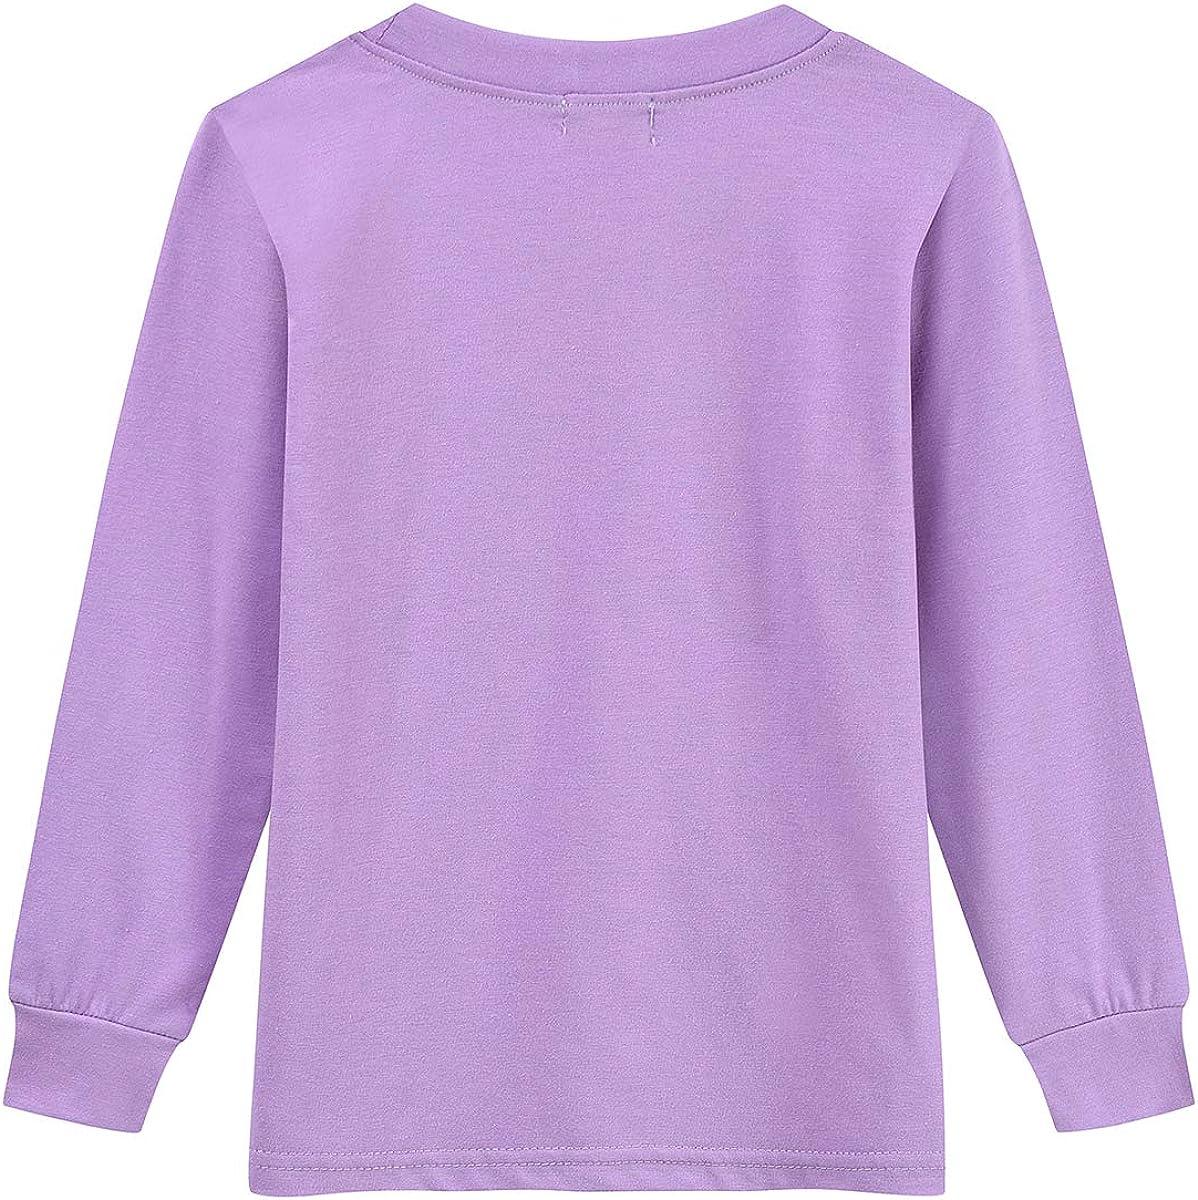 Toddler Girls Pajamas Sets Ladybug 100/% Cotton Flamingo Unicorn Pjs Jammies Long Sleeve Kids Sleepwear for Size 2-7 T